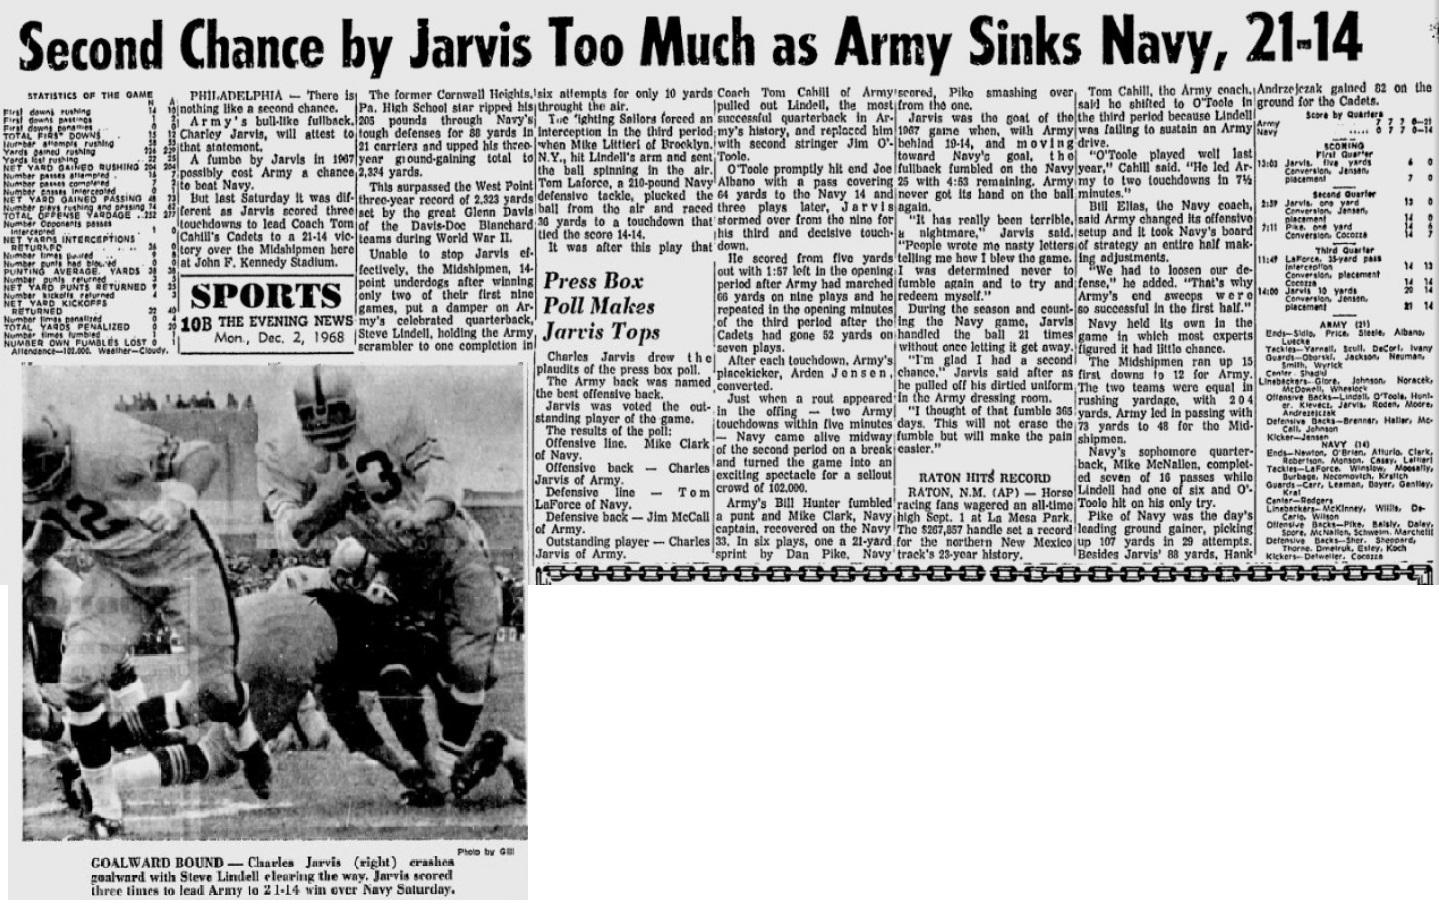 armyfb_1968_vsnavy-charleyjarvis_eveningnews_dec21968